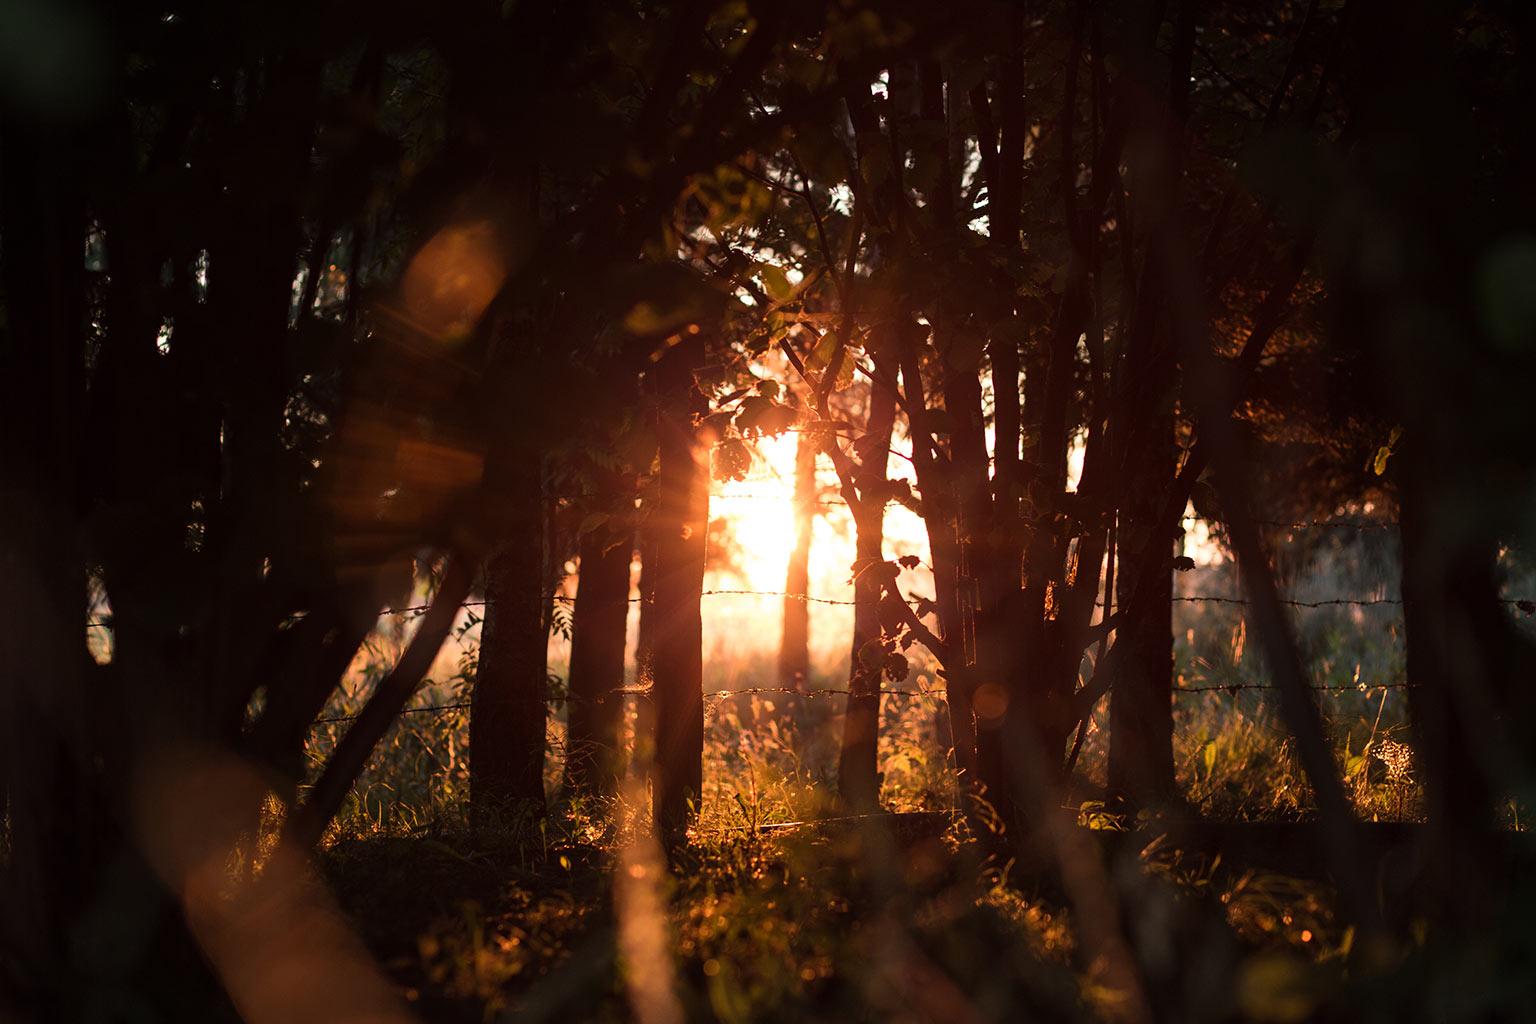 evening sunlight through trees